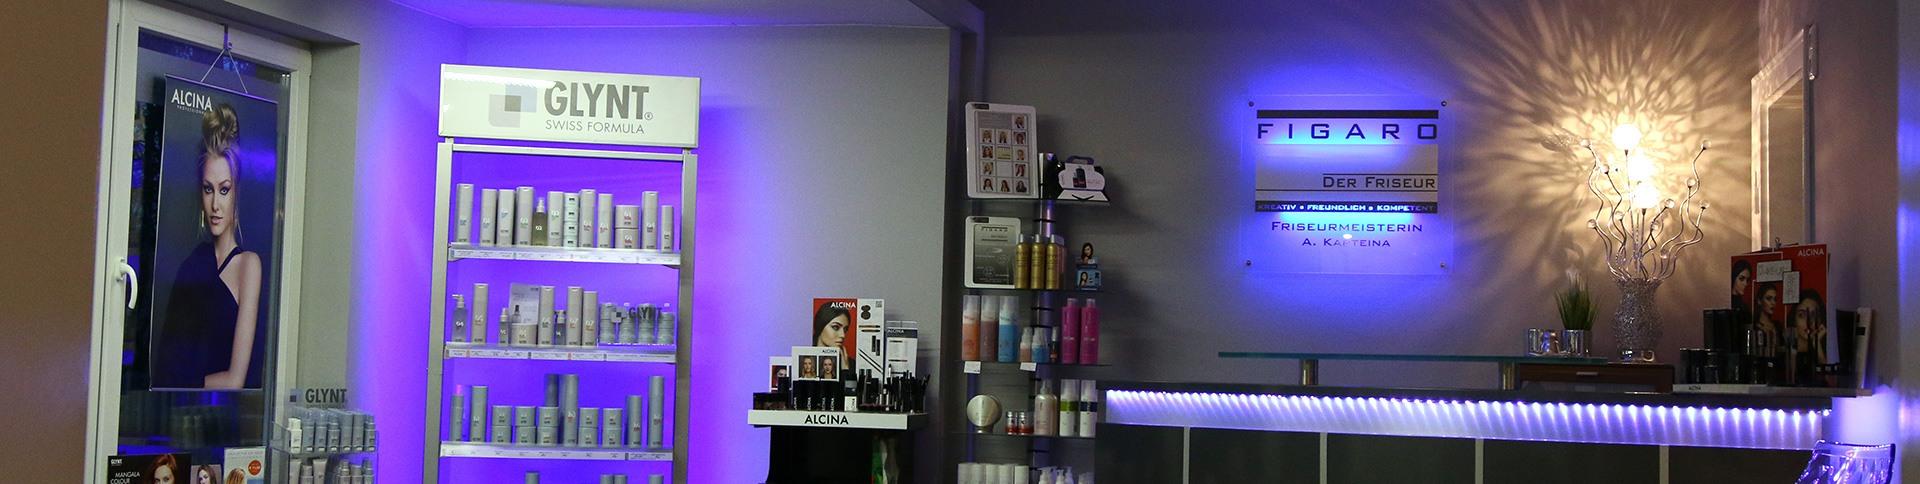 Figaro der Friseur Salon